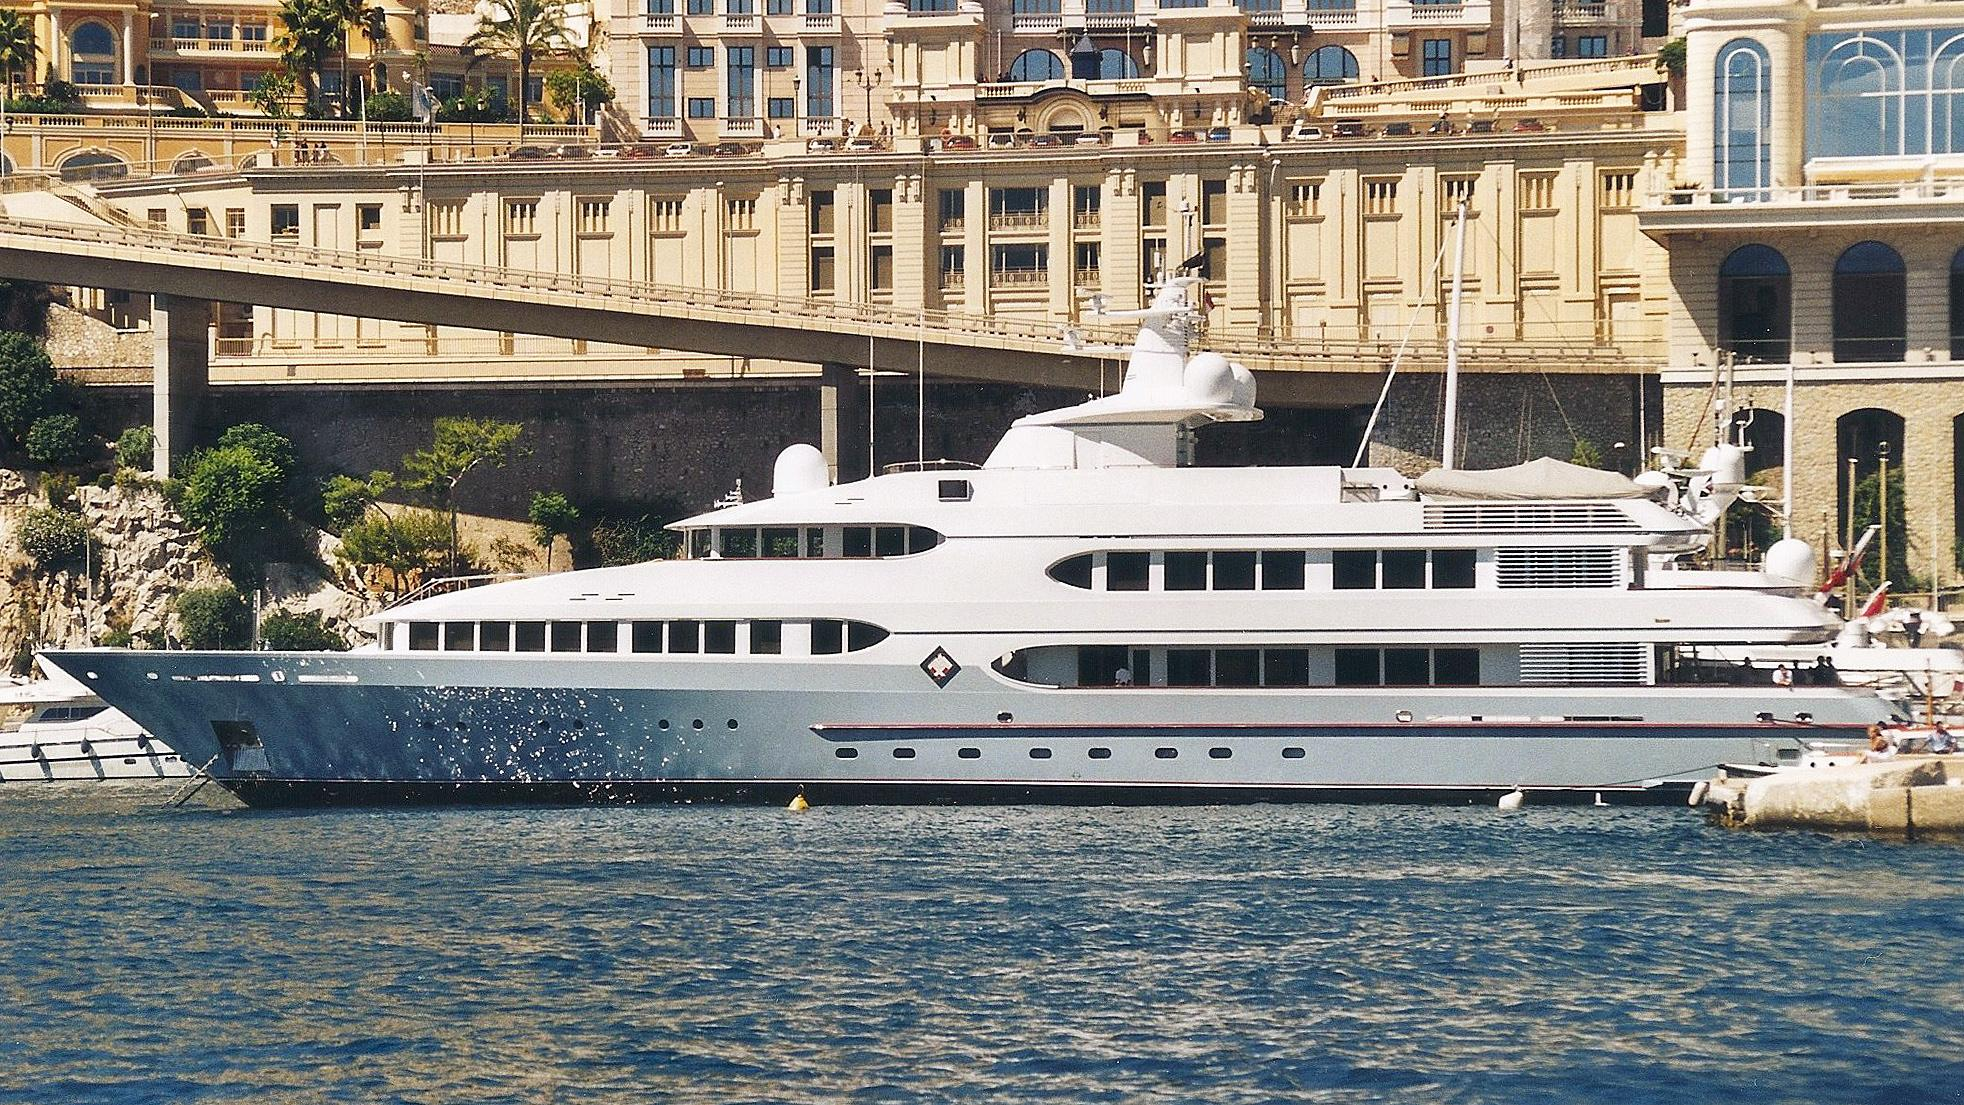 samax-motor-yacht-feadship-1996-55m-profile